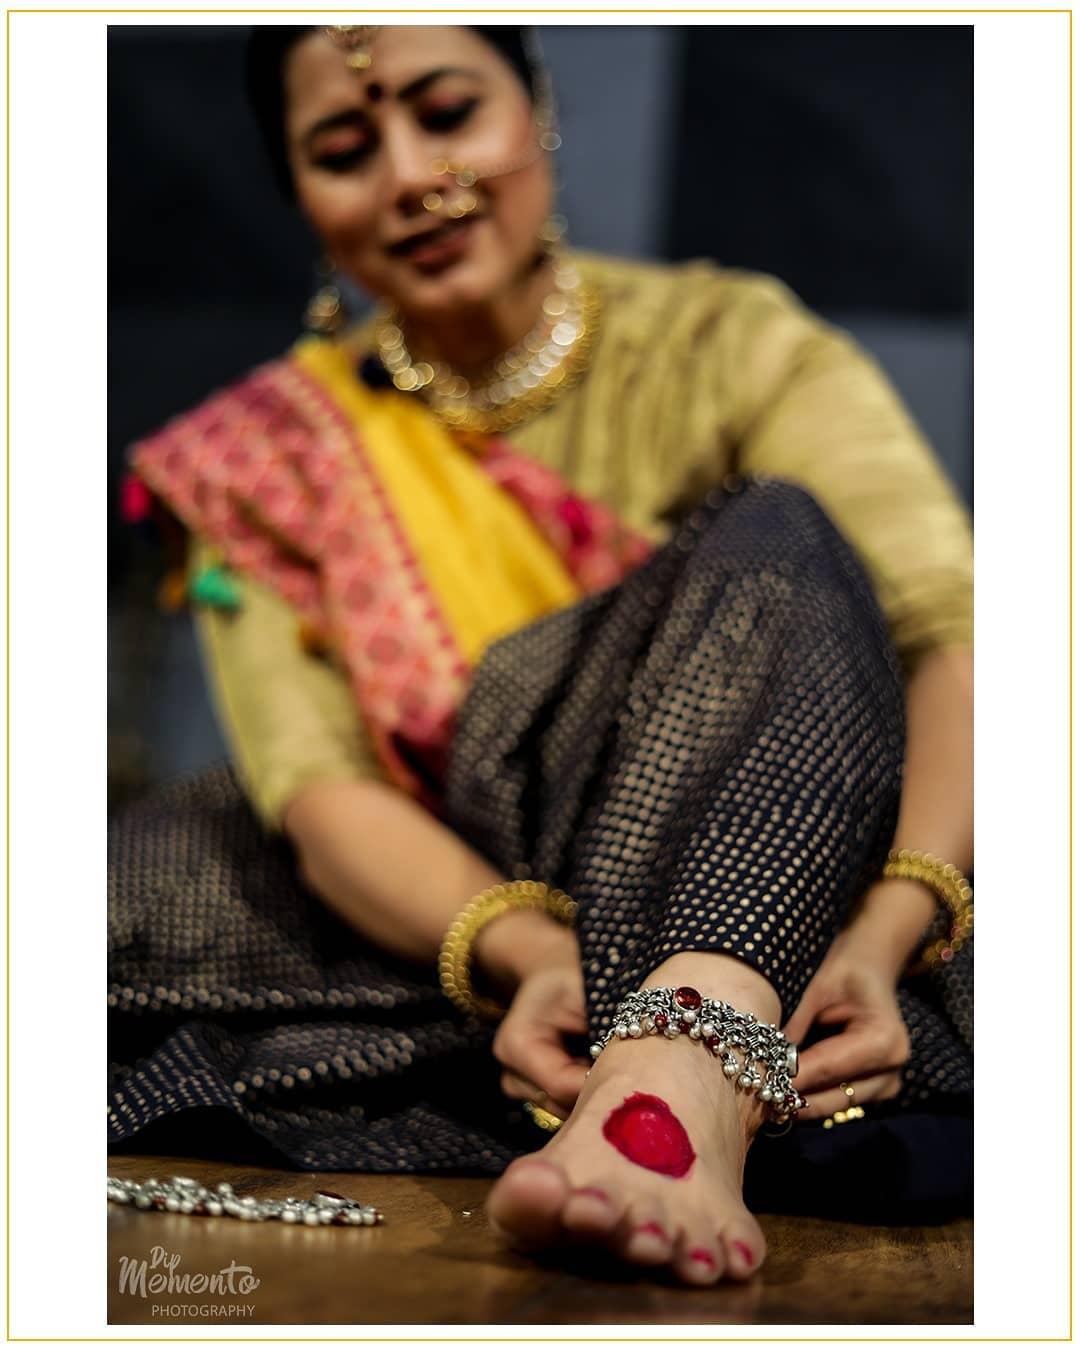 Dip Memento Photography,  kathak, singaarkorehnedo, shreyaghoshal, gulzarsahab, jashodapatel, nrityalaya, classicalchoreography, classicaldance, indiandancefederation, dancephotographer, indiandancerscommunity, dancersofinstagram, kathak_space, 9924227745, kathaklovers, danceoftalent, kathakdancers, gulzar, kathakfusion, dipmementophotography, dancevideo, dancers, dancelovers, dancersofinstagram, photography, videography